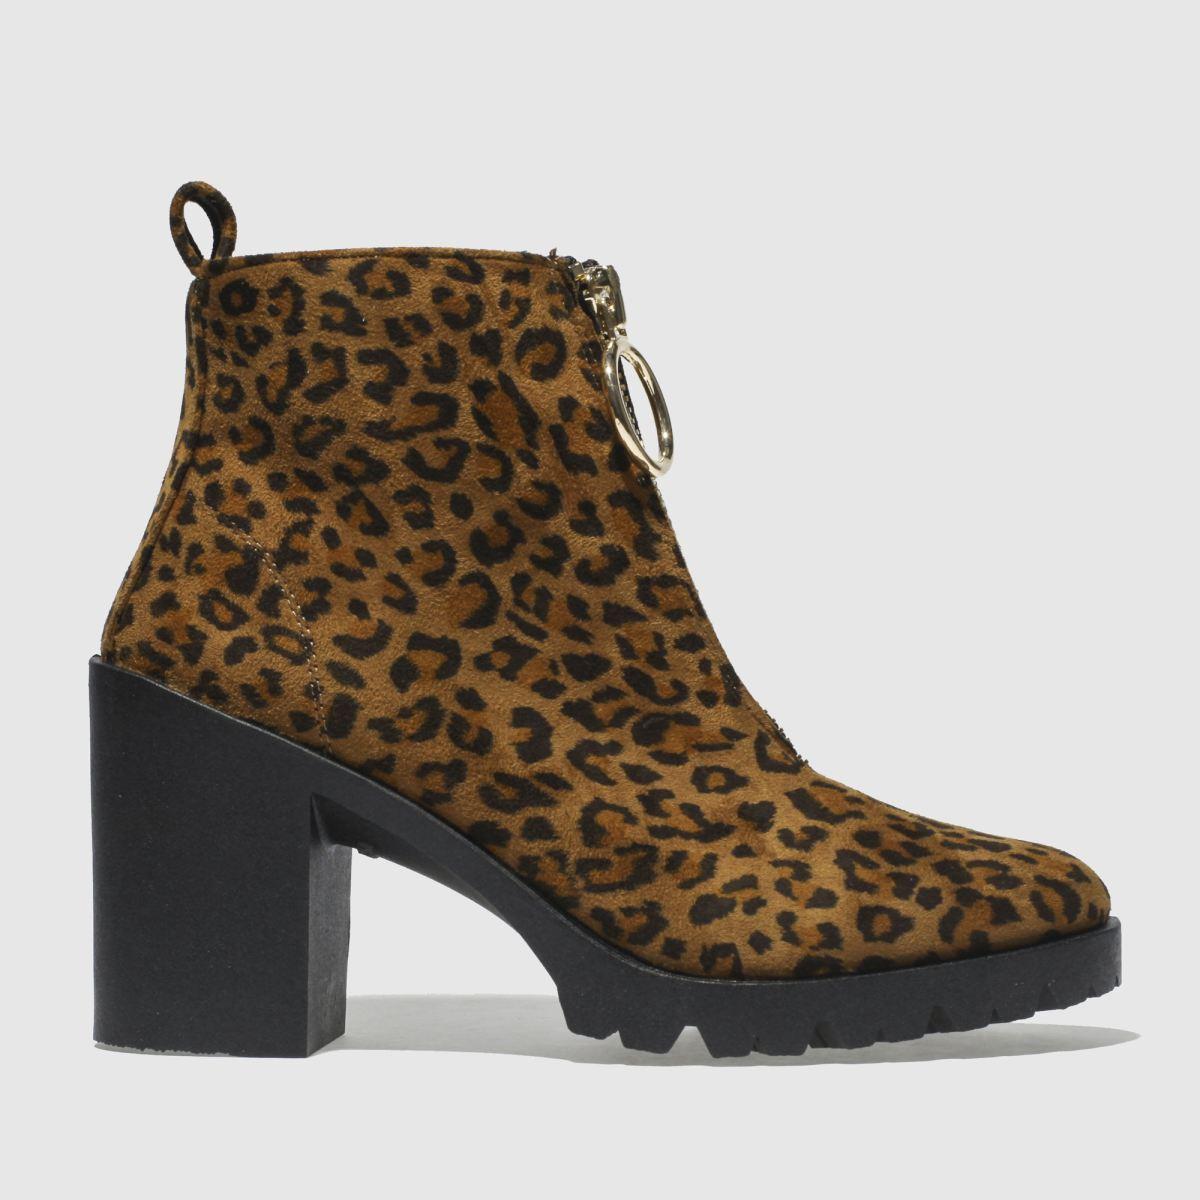 Schuh Tan & Black Dilemma Boots